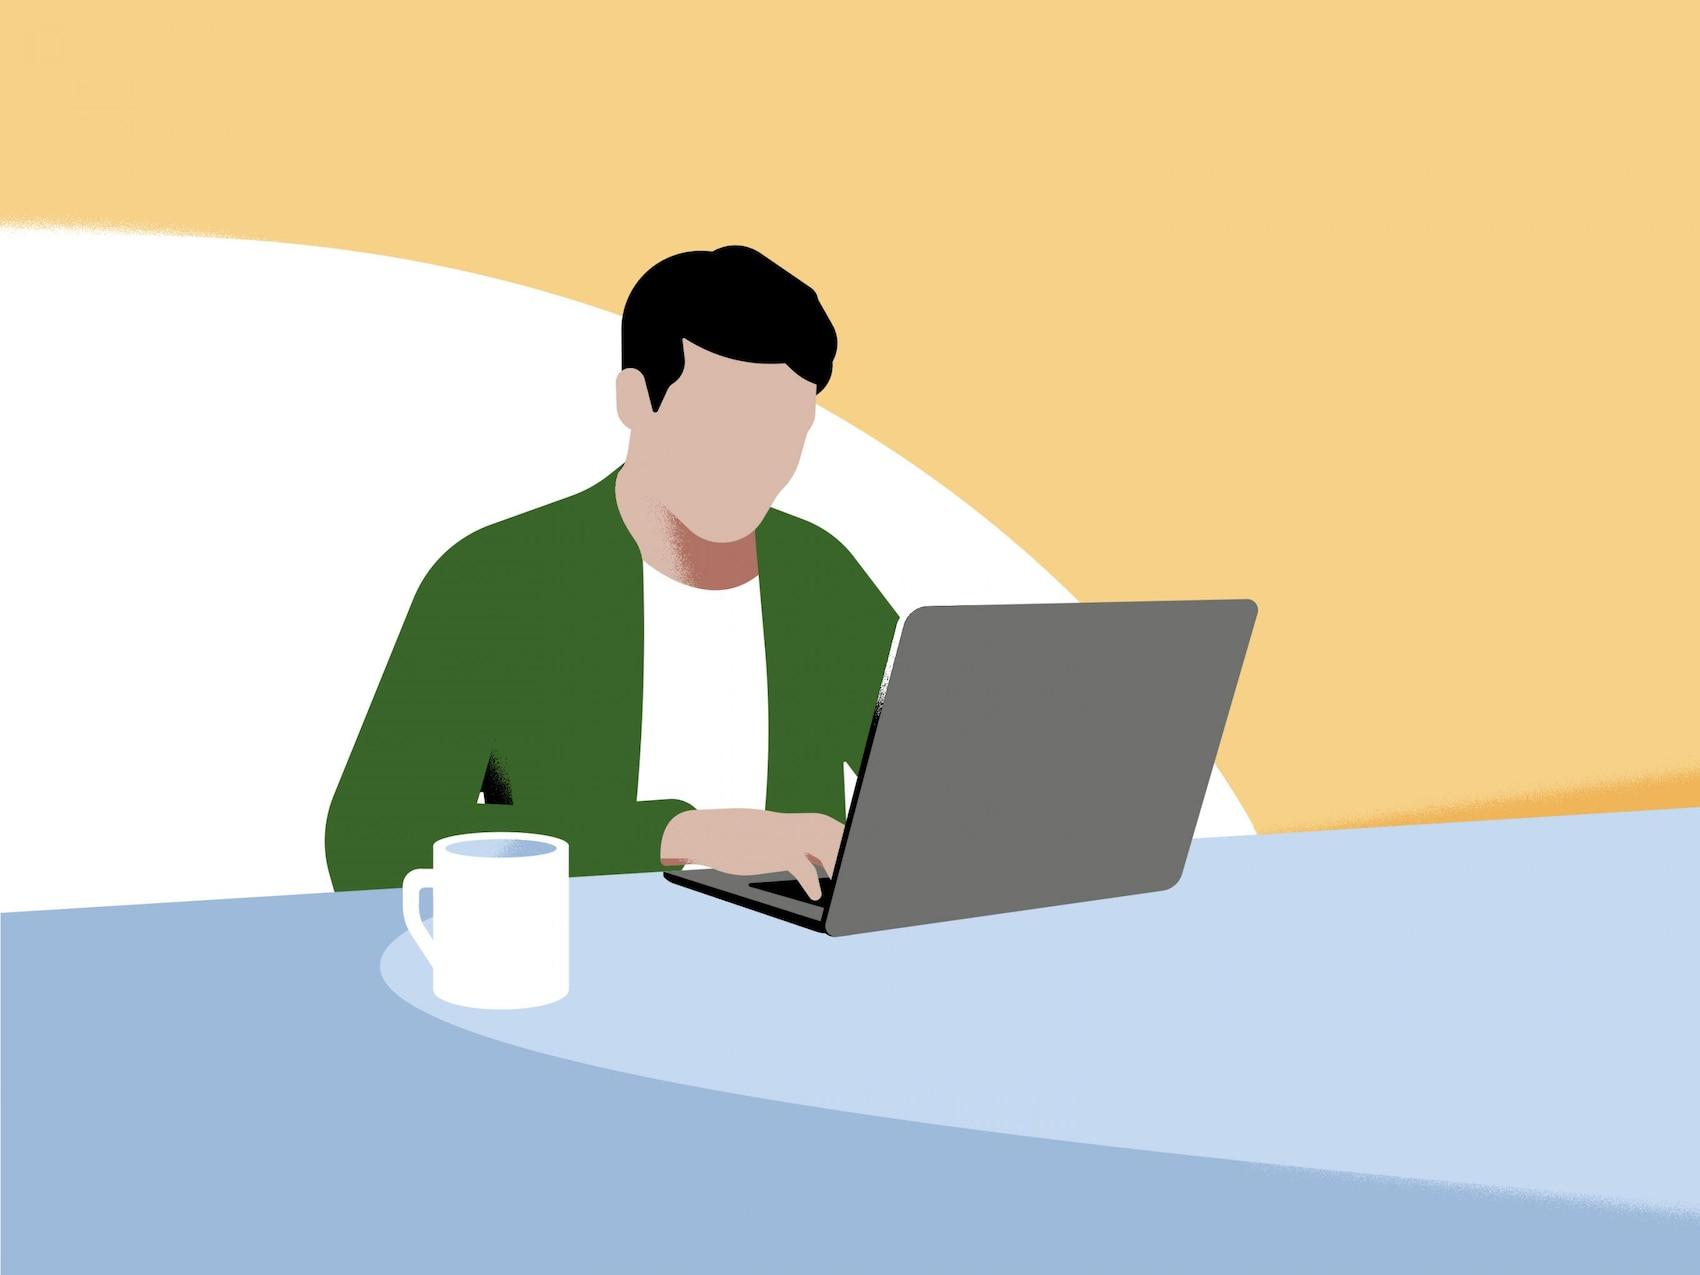 Man zit achter computer